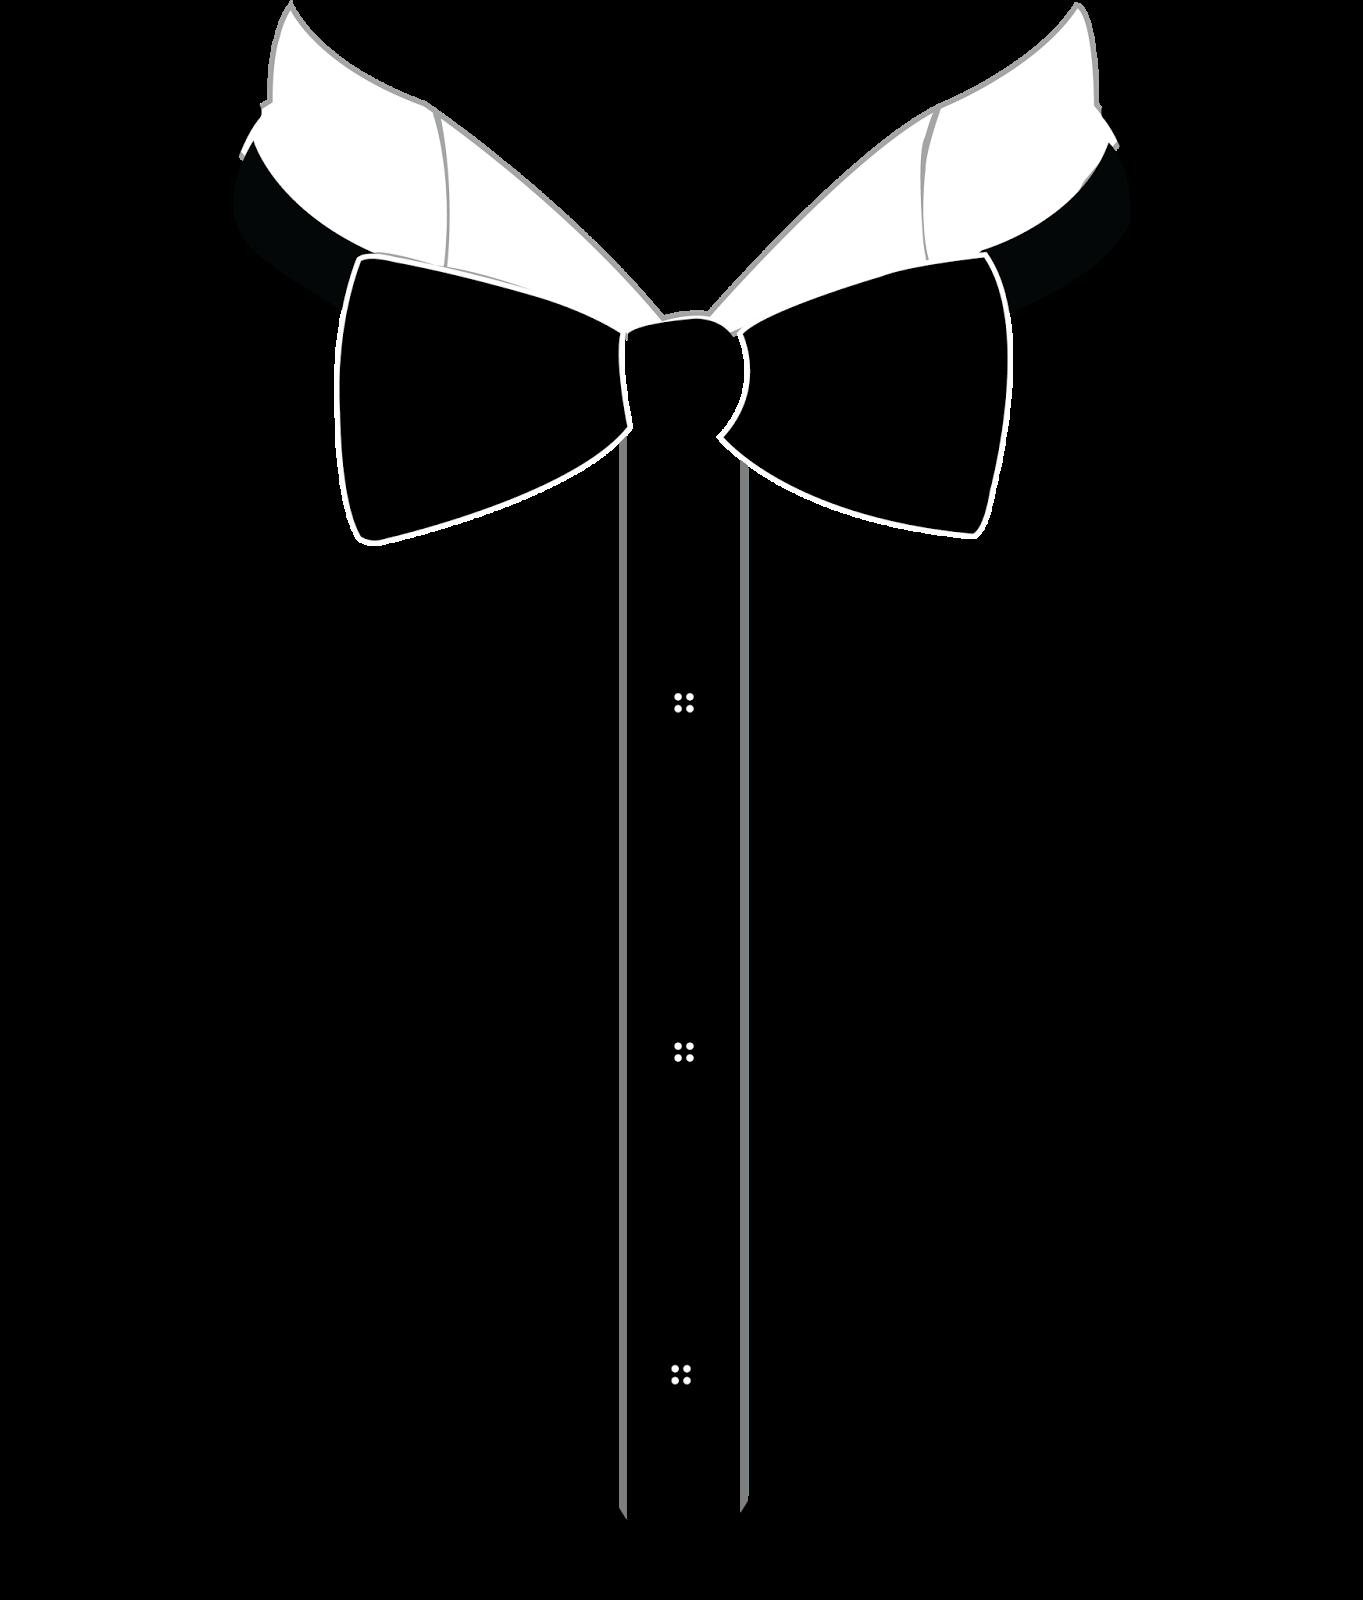 clip art royalty free library Bow tie Tuxedo Suit Black tie